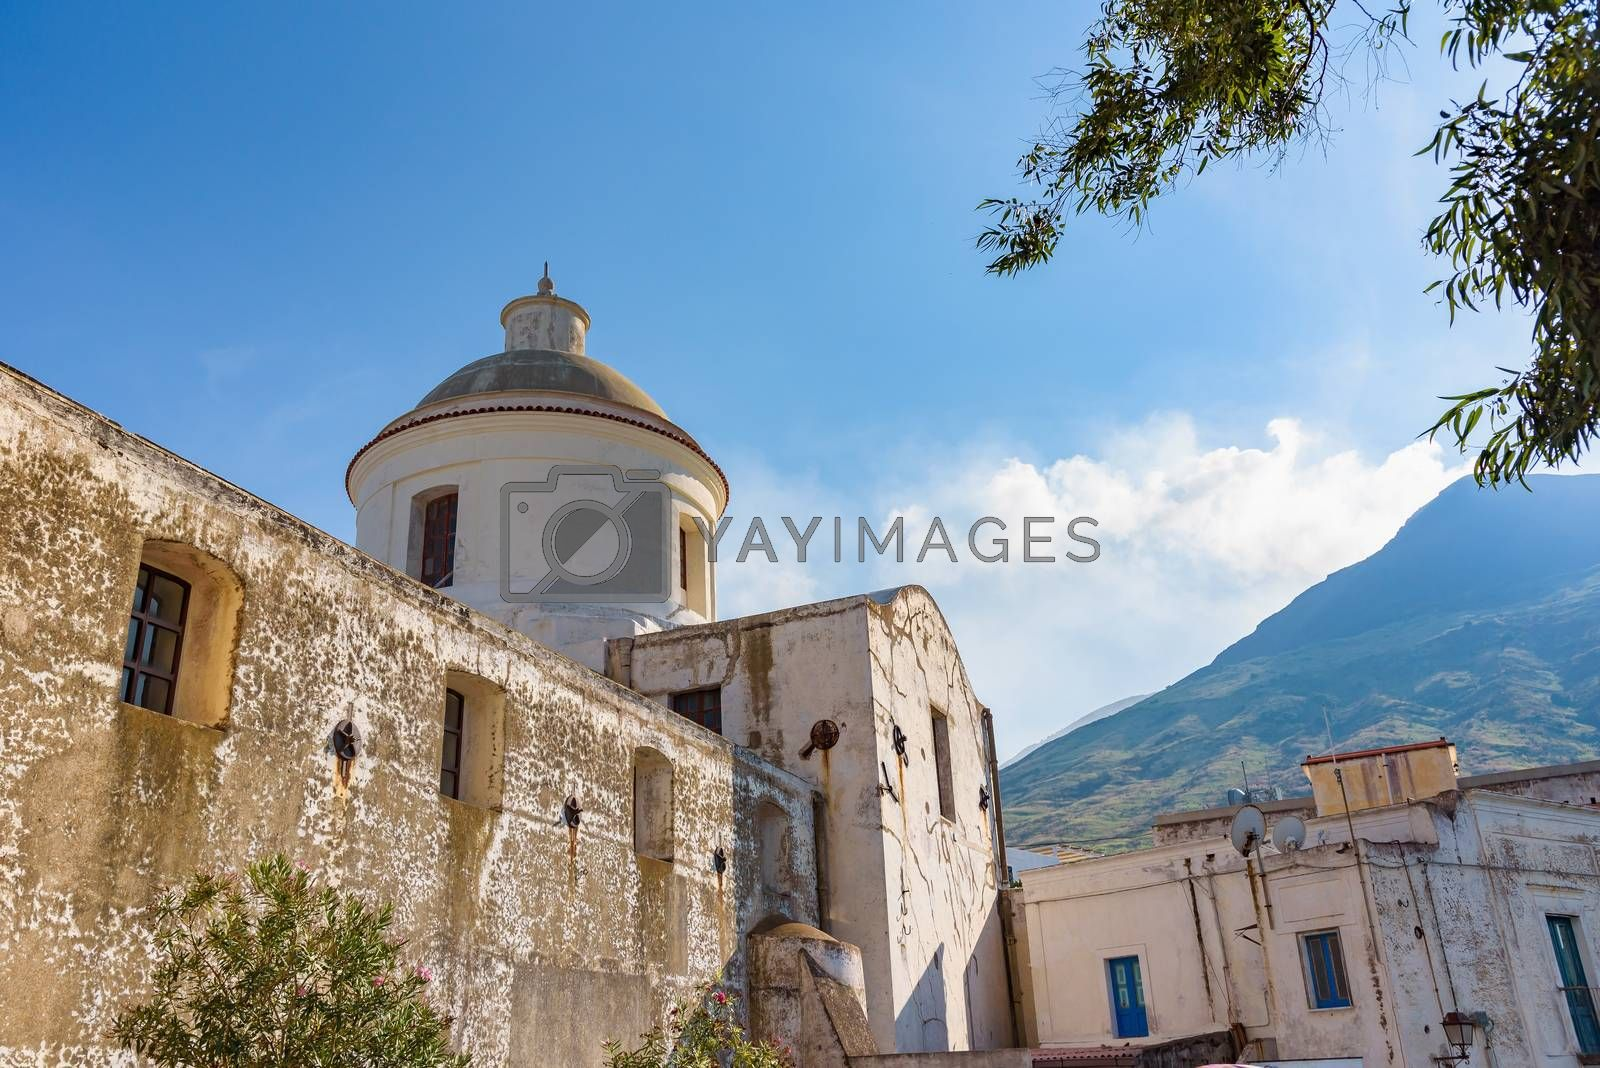 Church of San Vincenzo Ferreri in Stromboli village, Aeolian Islands, Italy